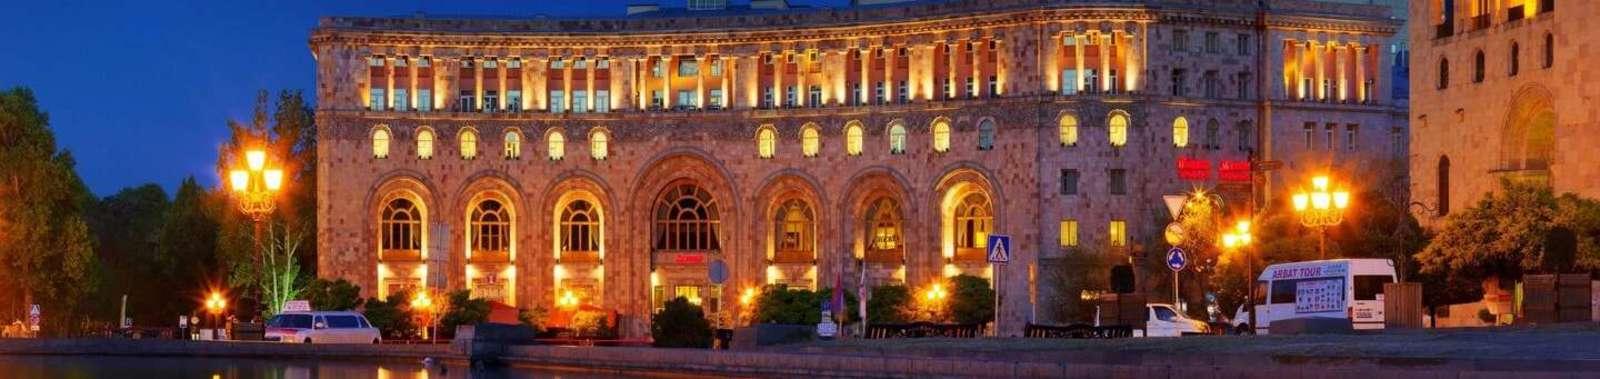 Stay at the luxury Armenia Marriott Hotel in Yerevan